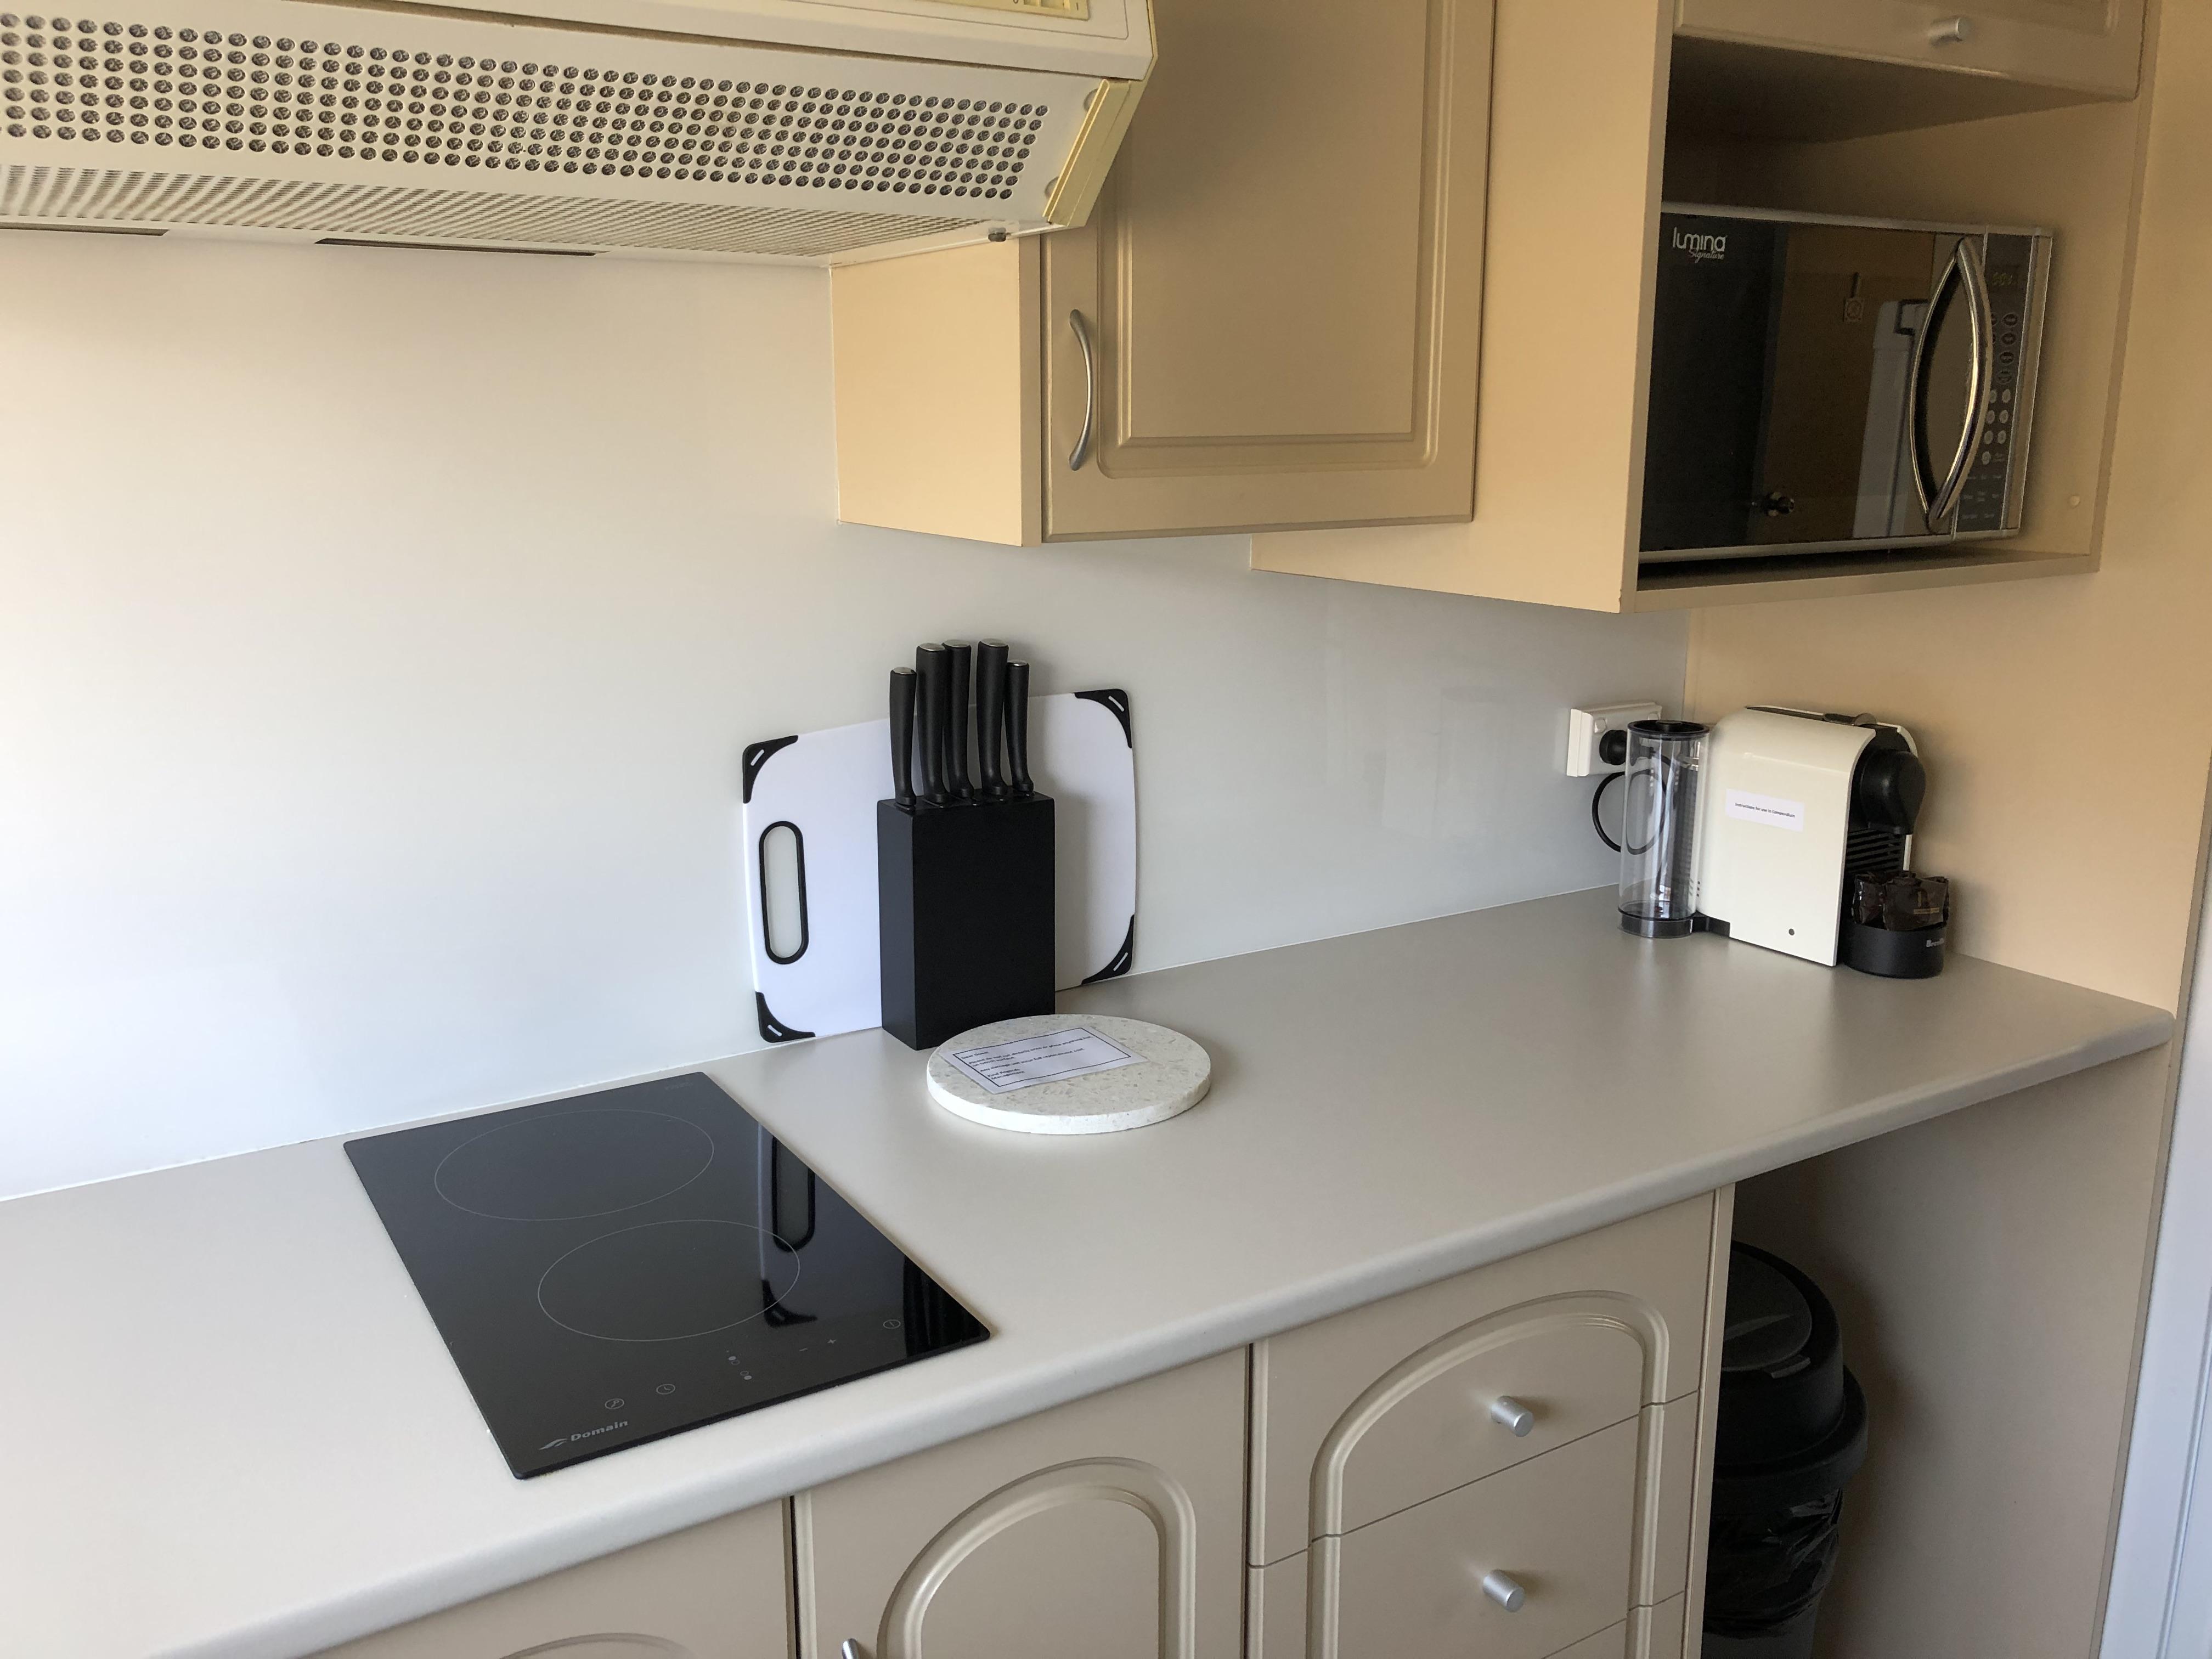 Hotplates and coffee machine